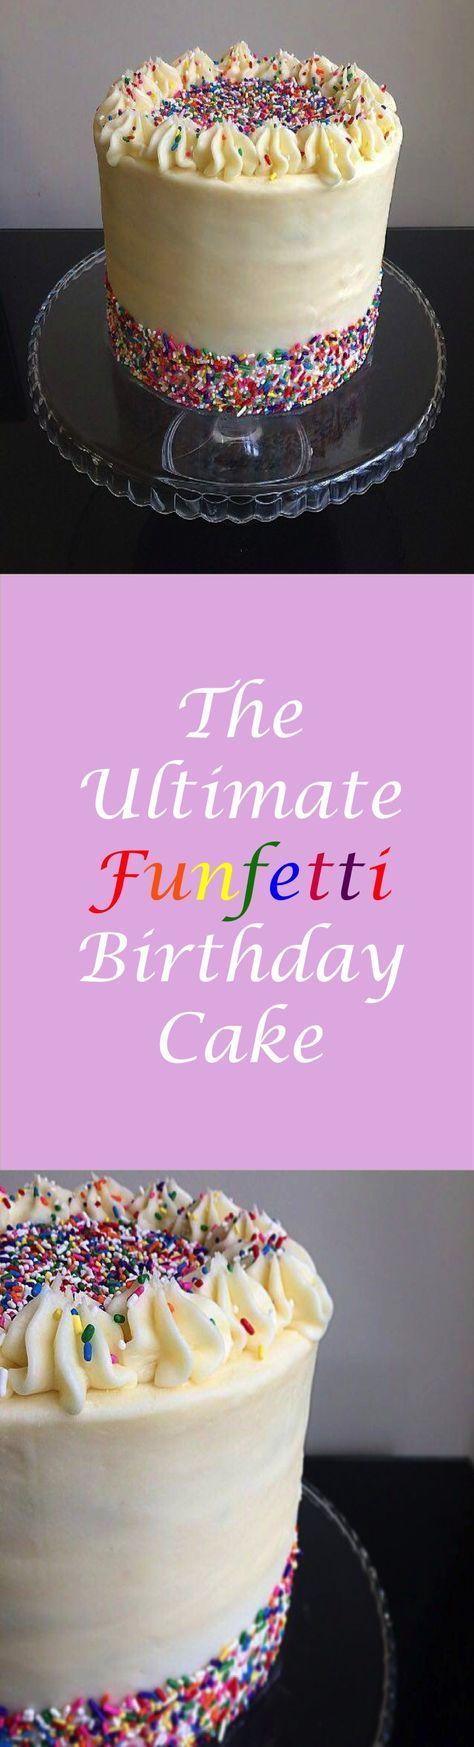 Easy Make Birthday Cakes Search Easy Make Birthday Cakes